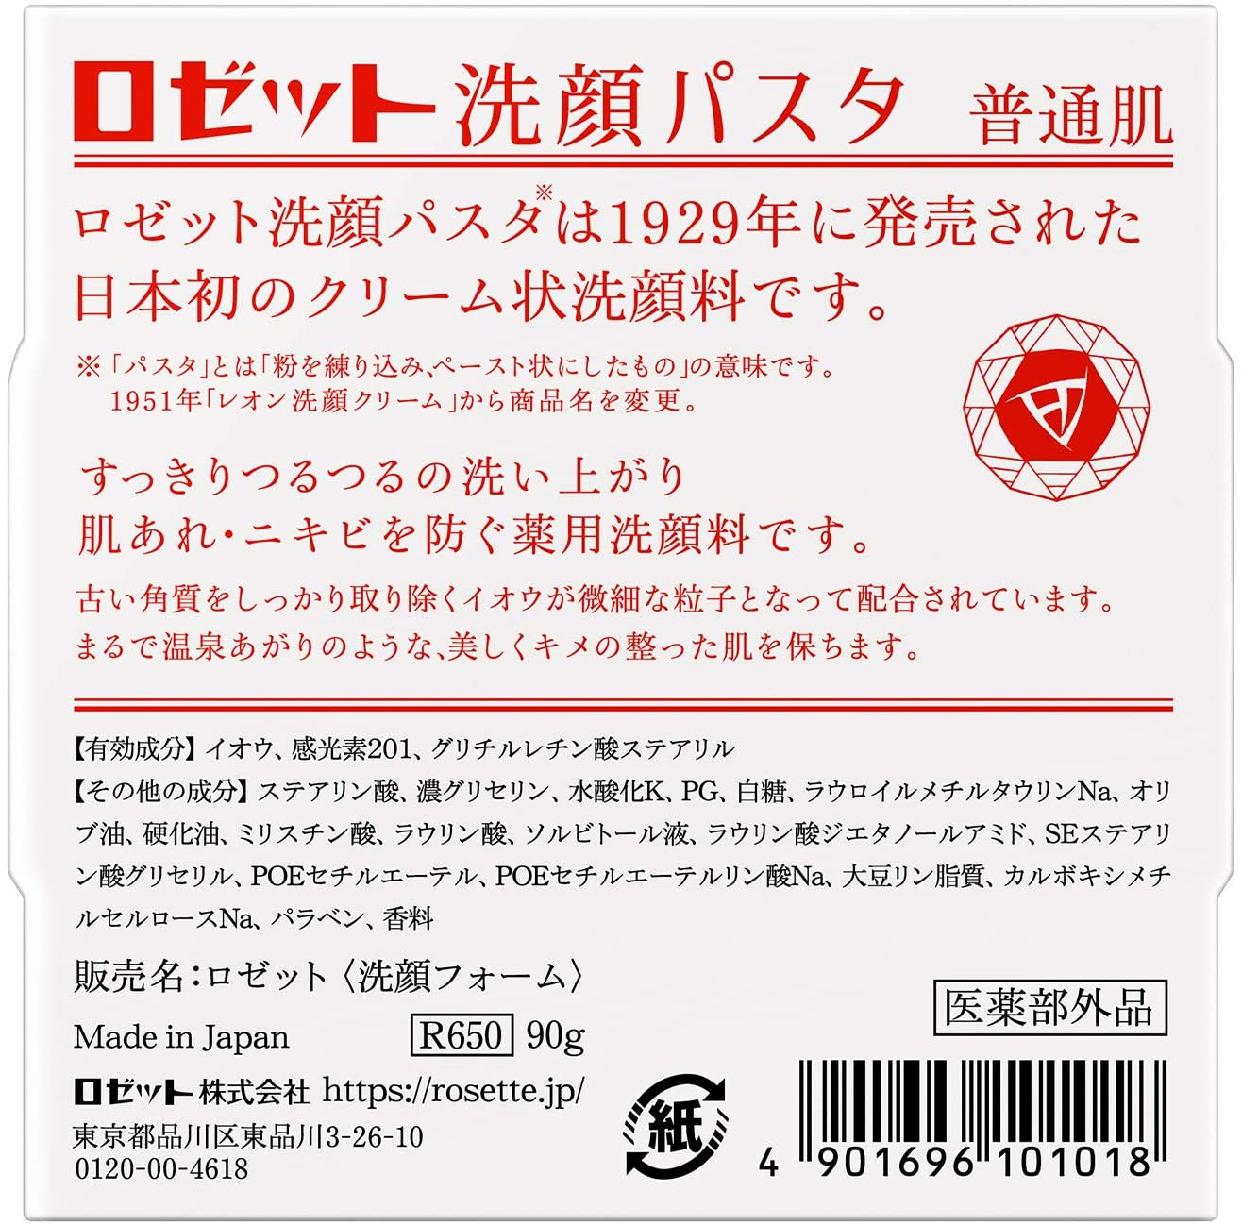 ROSETTE(ロゼット) 洗顔パスタ 普通肌の商品画像2